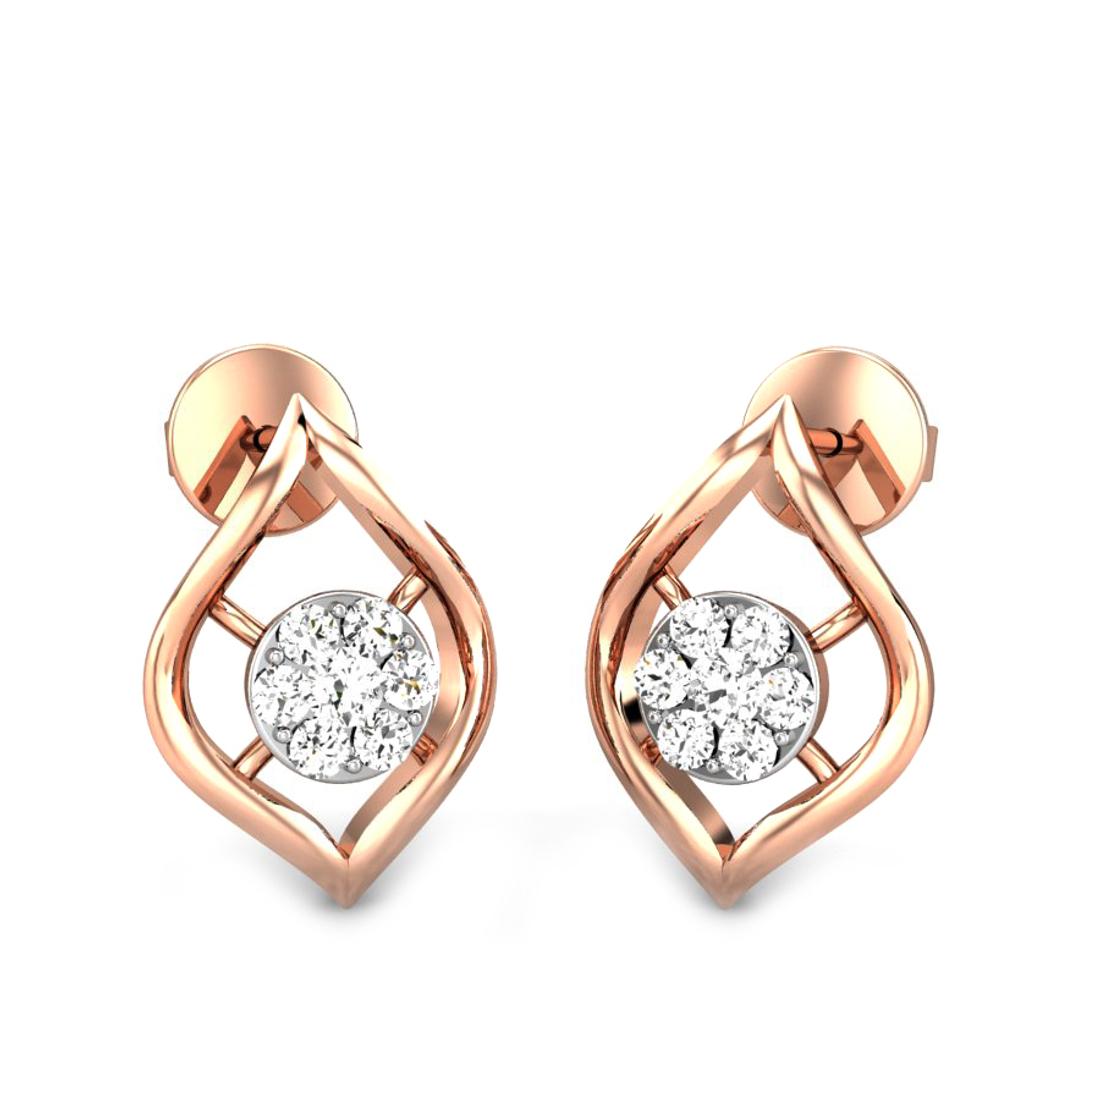 Candere by Kalyan Jewellers Rose Gold Cari Ziah Diamond Earrings for Women (IGI Certified Diamonds)